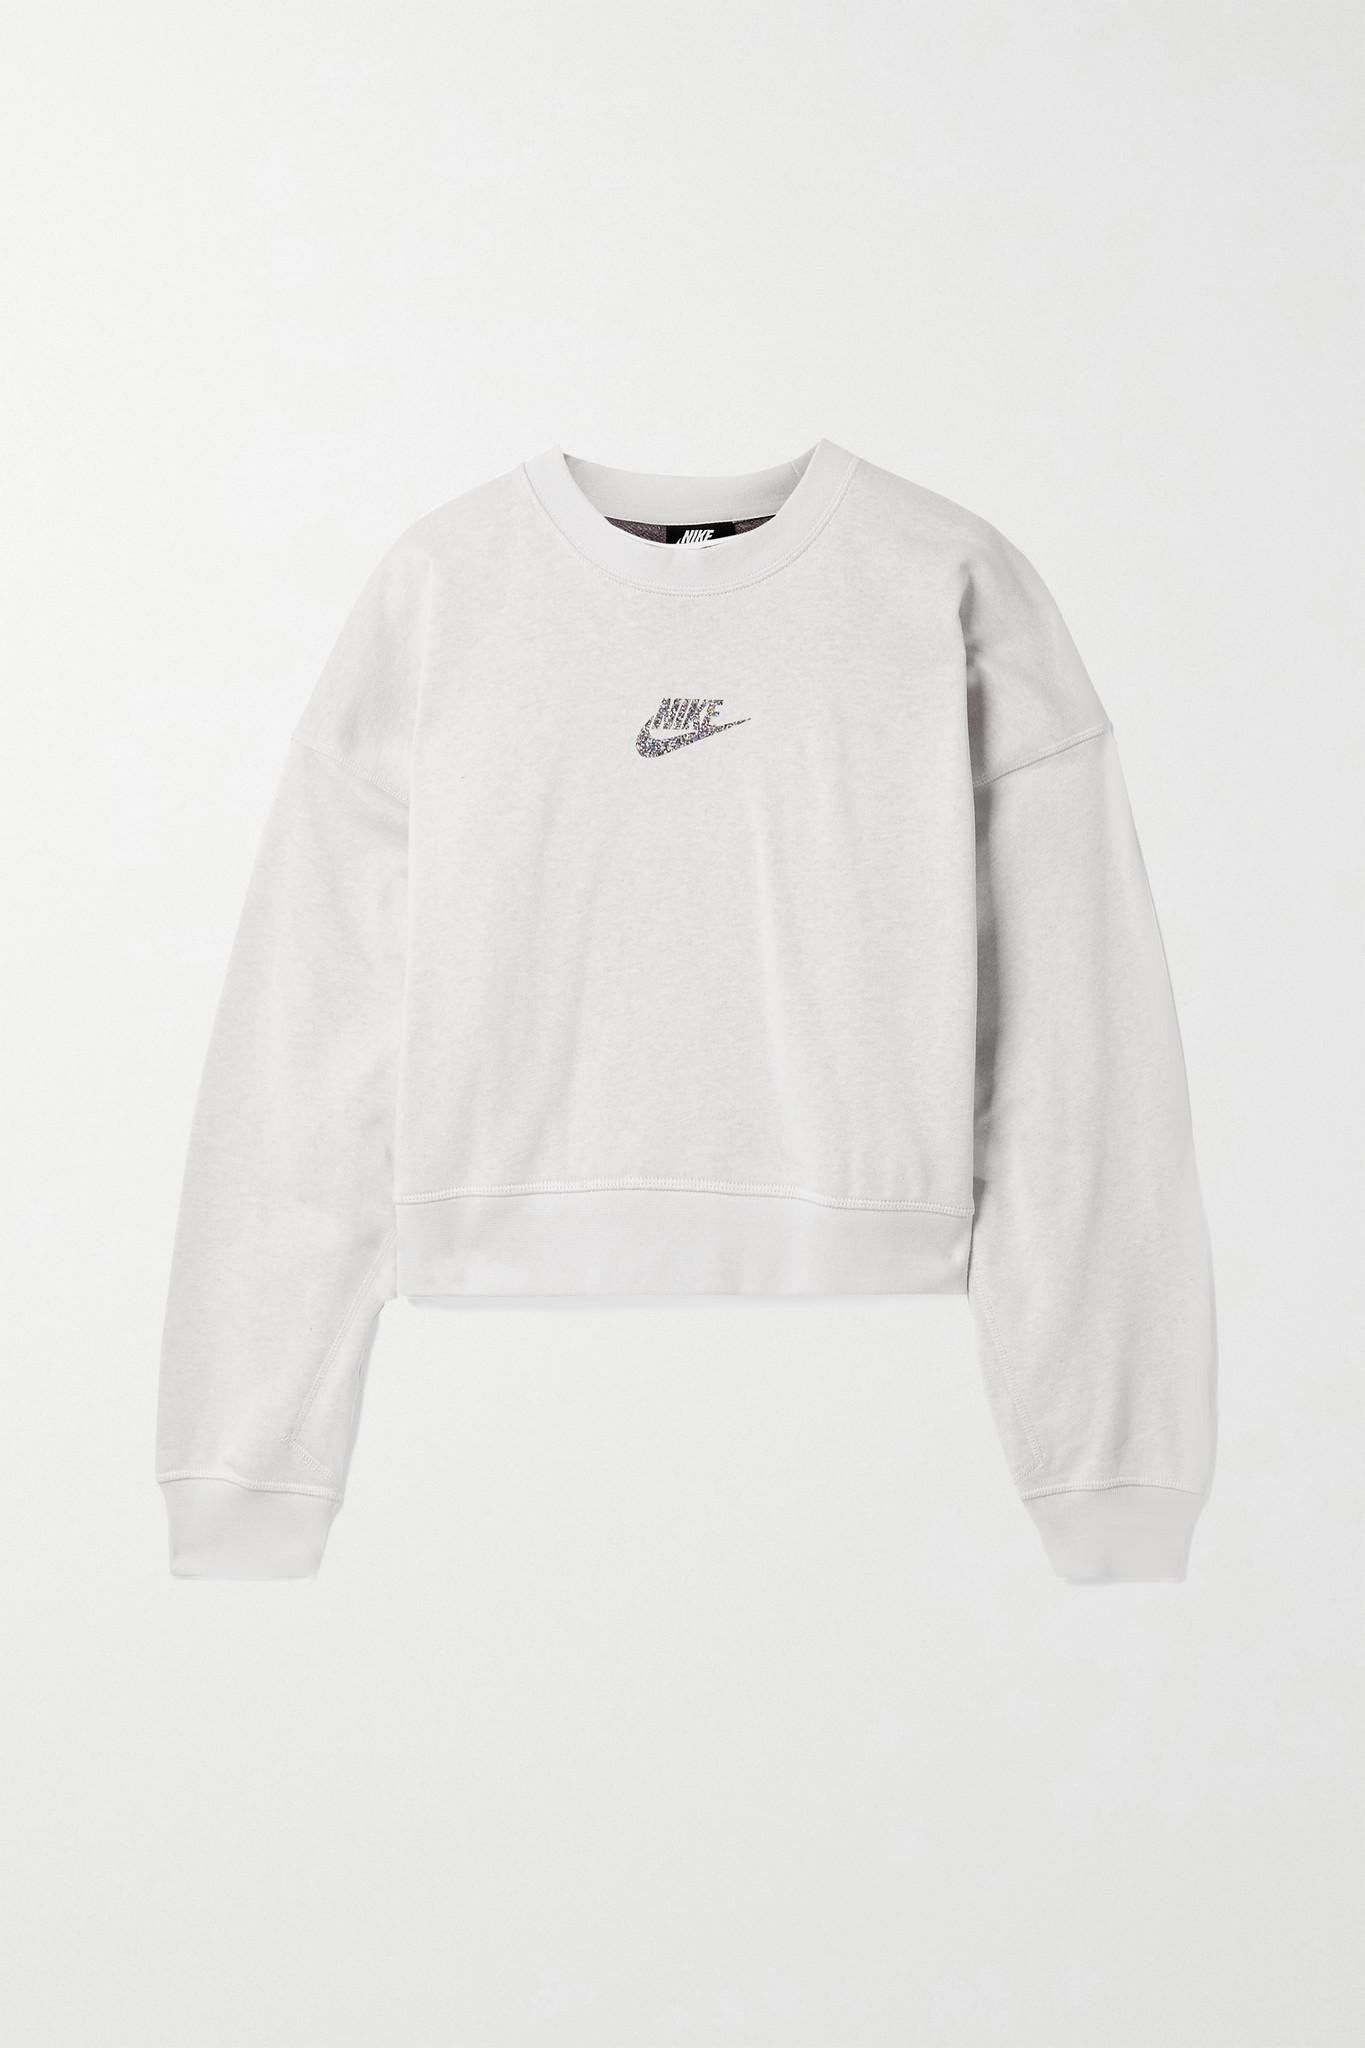 NIKE - Sportswear 大廓形印花棉质混纺平纹布卫衣 - 灰色 - x large